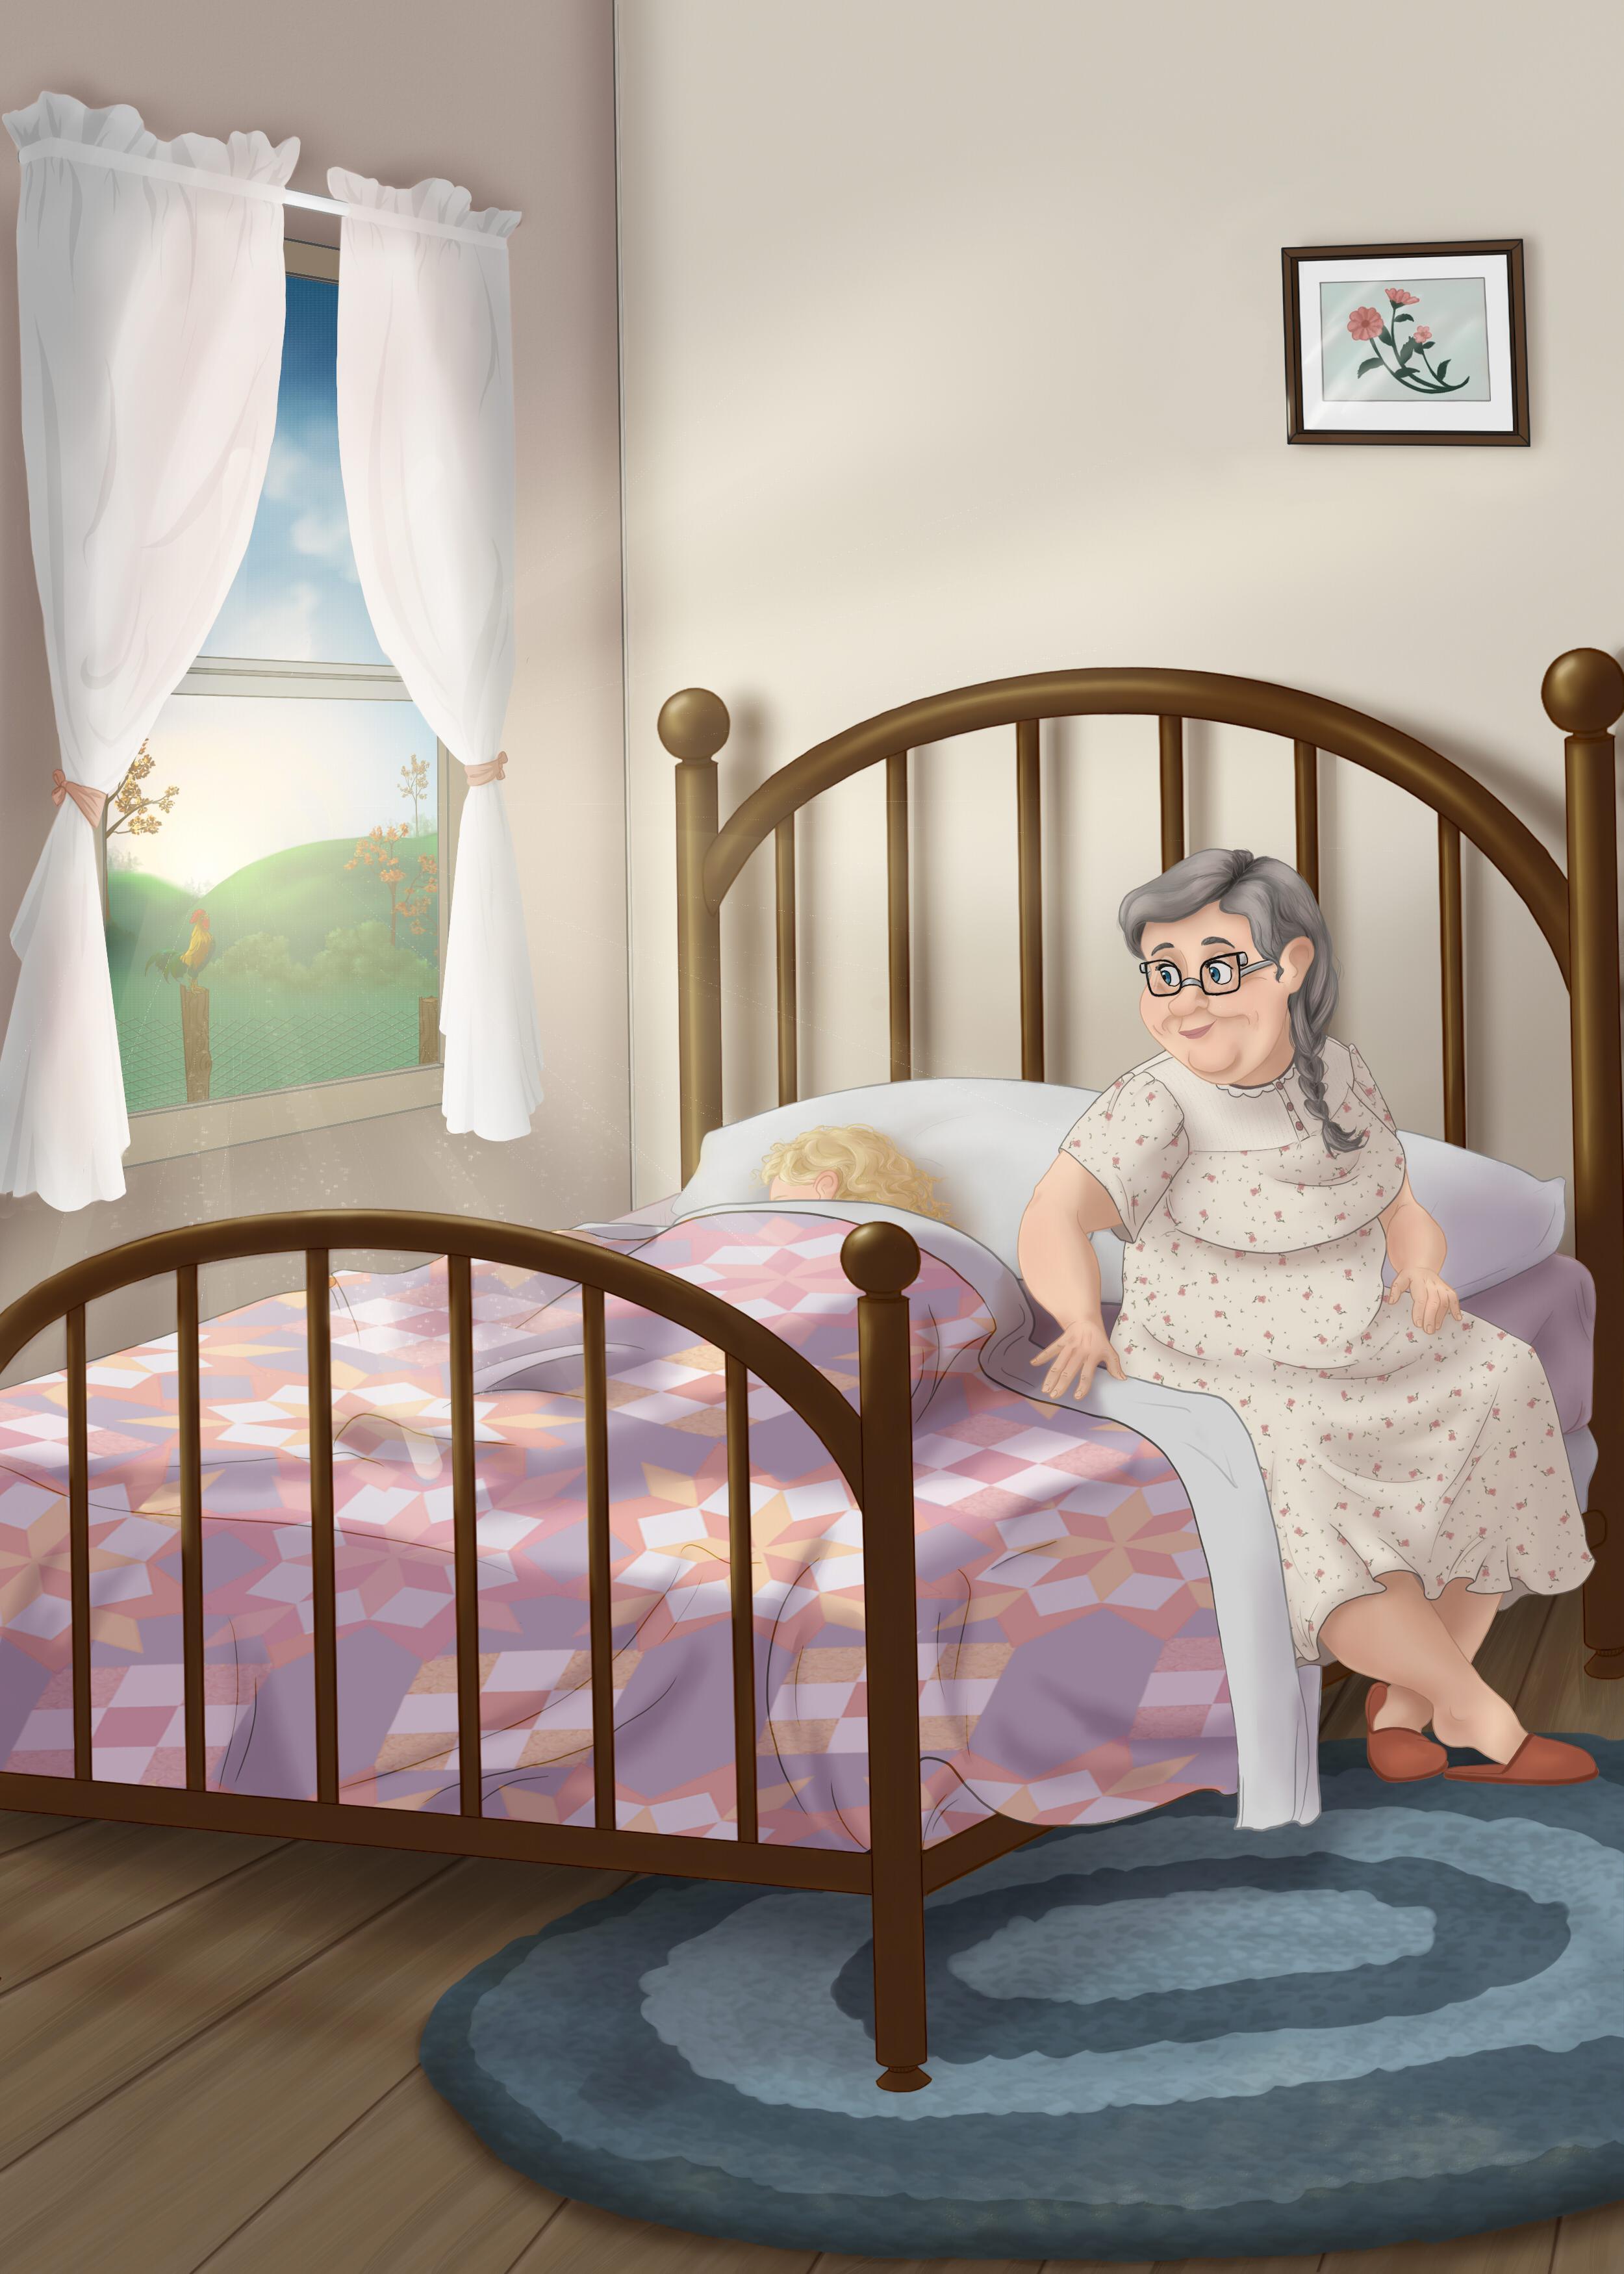 1st illustration